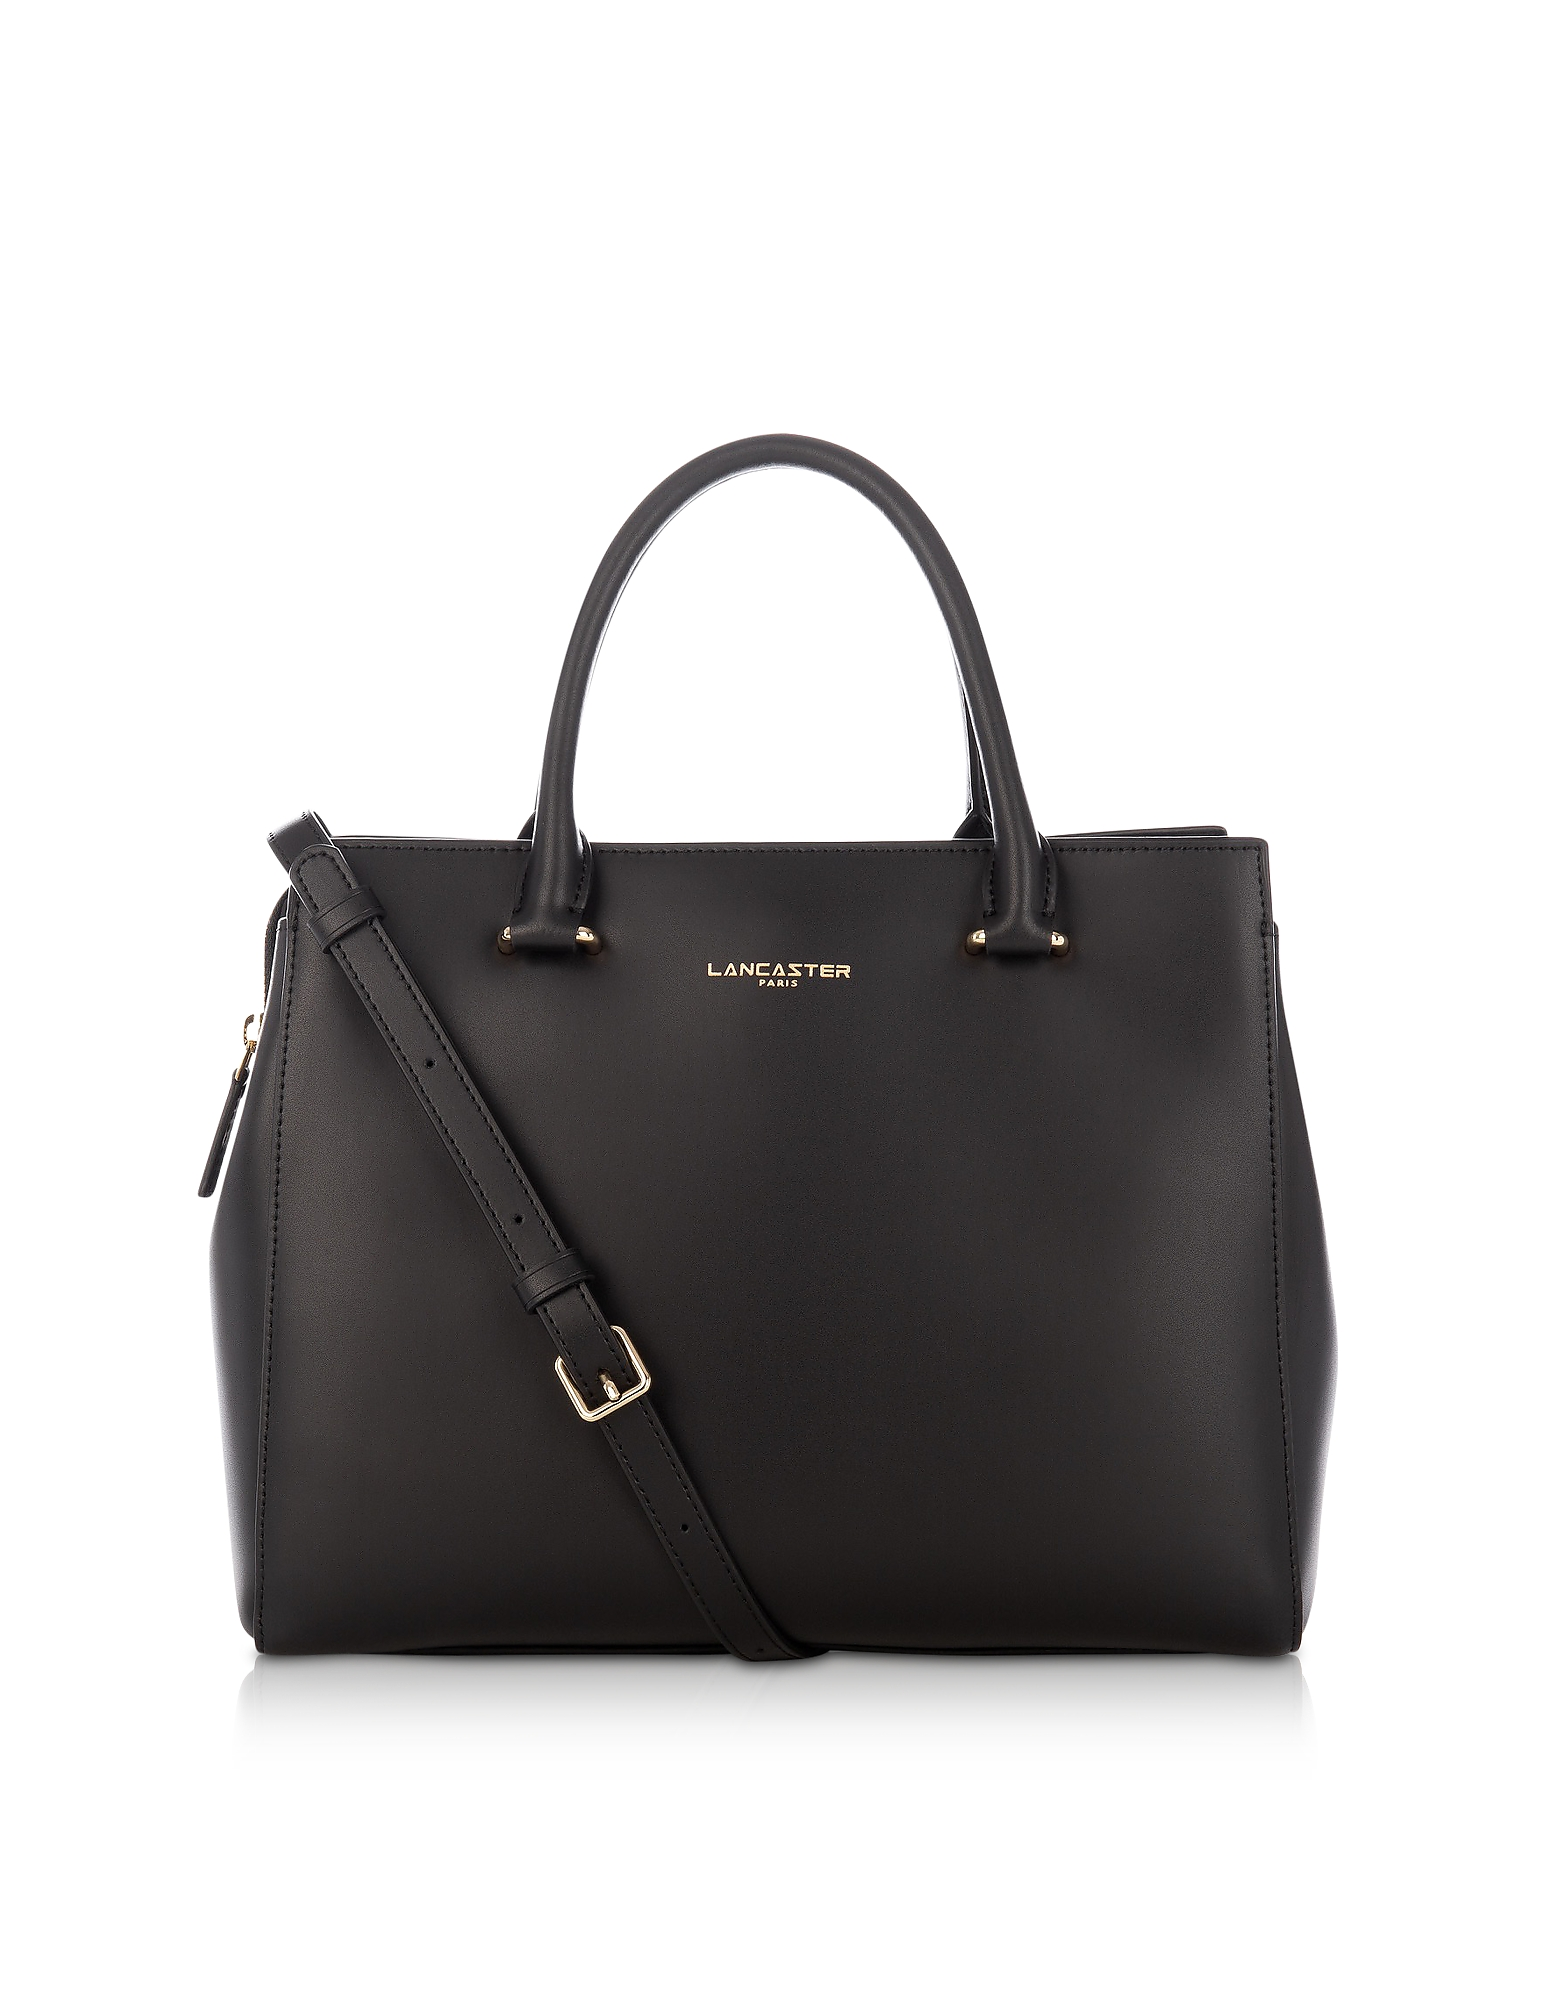 Lancaster Paris Handbags, Camelia Smooth Leather Top Handle Satchel Bag